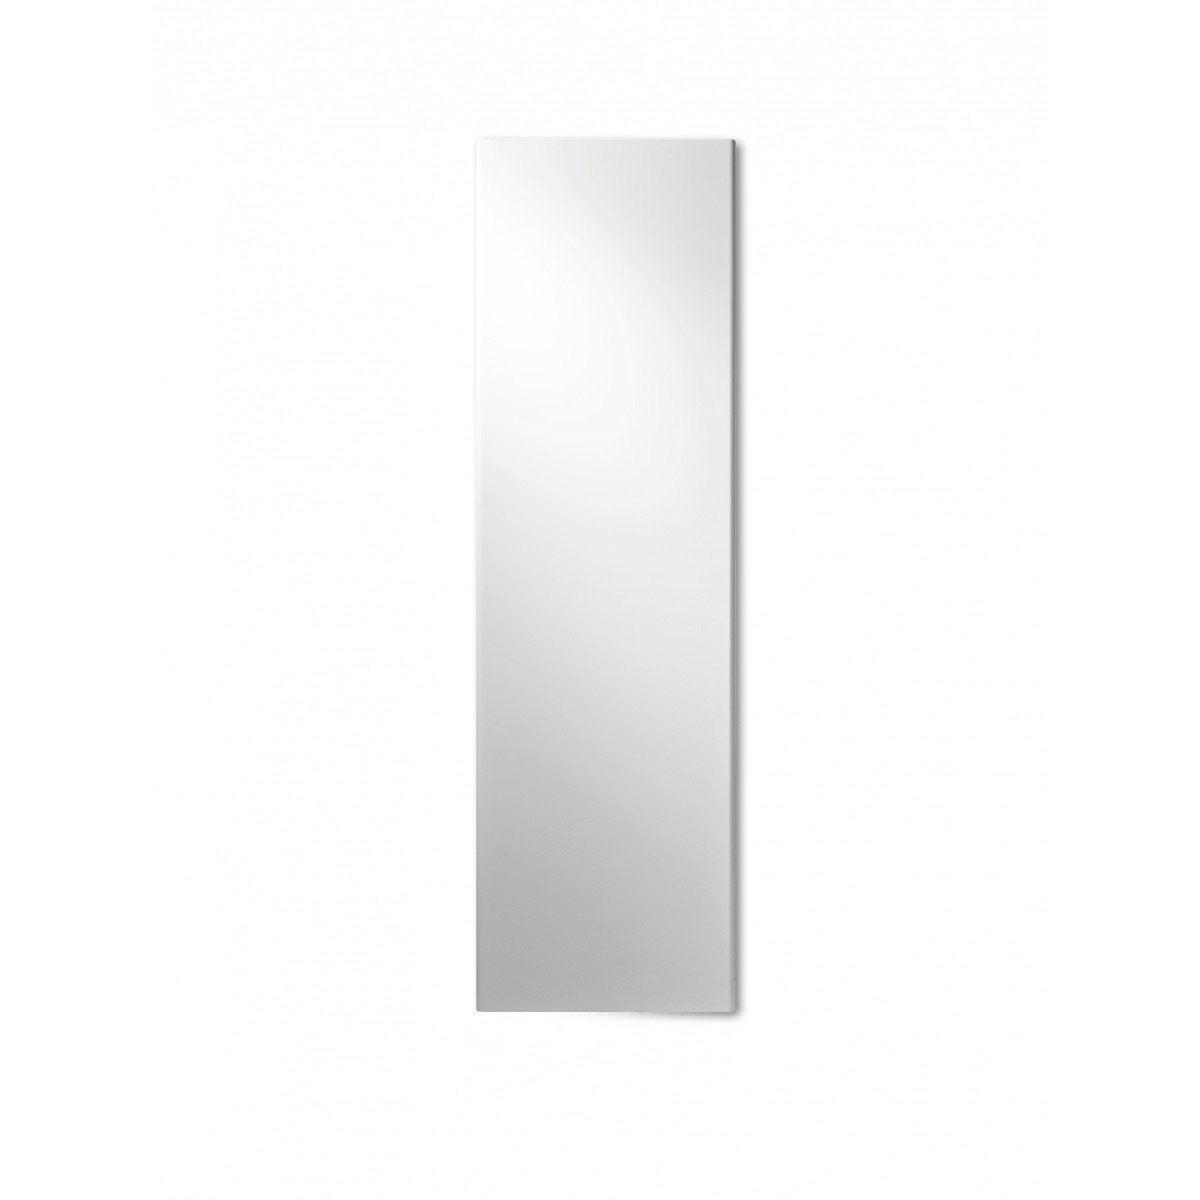 radiateur chauffage central nivasoft gris anthracite sabl cm 1023 w leroy merlin. Black Bedroom Furniture Sets. Home Design Ideas